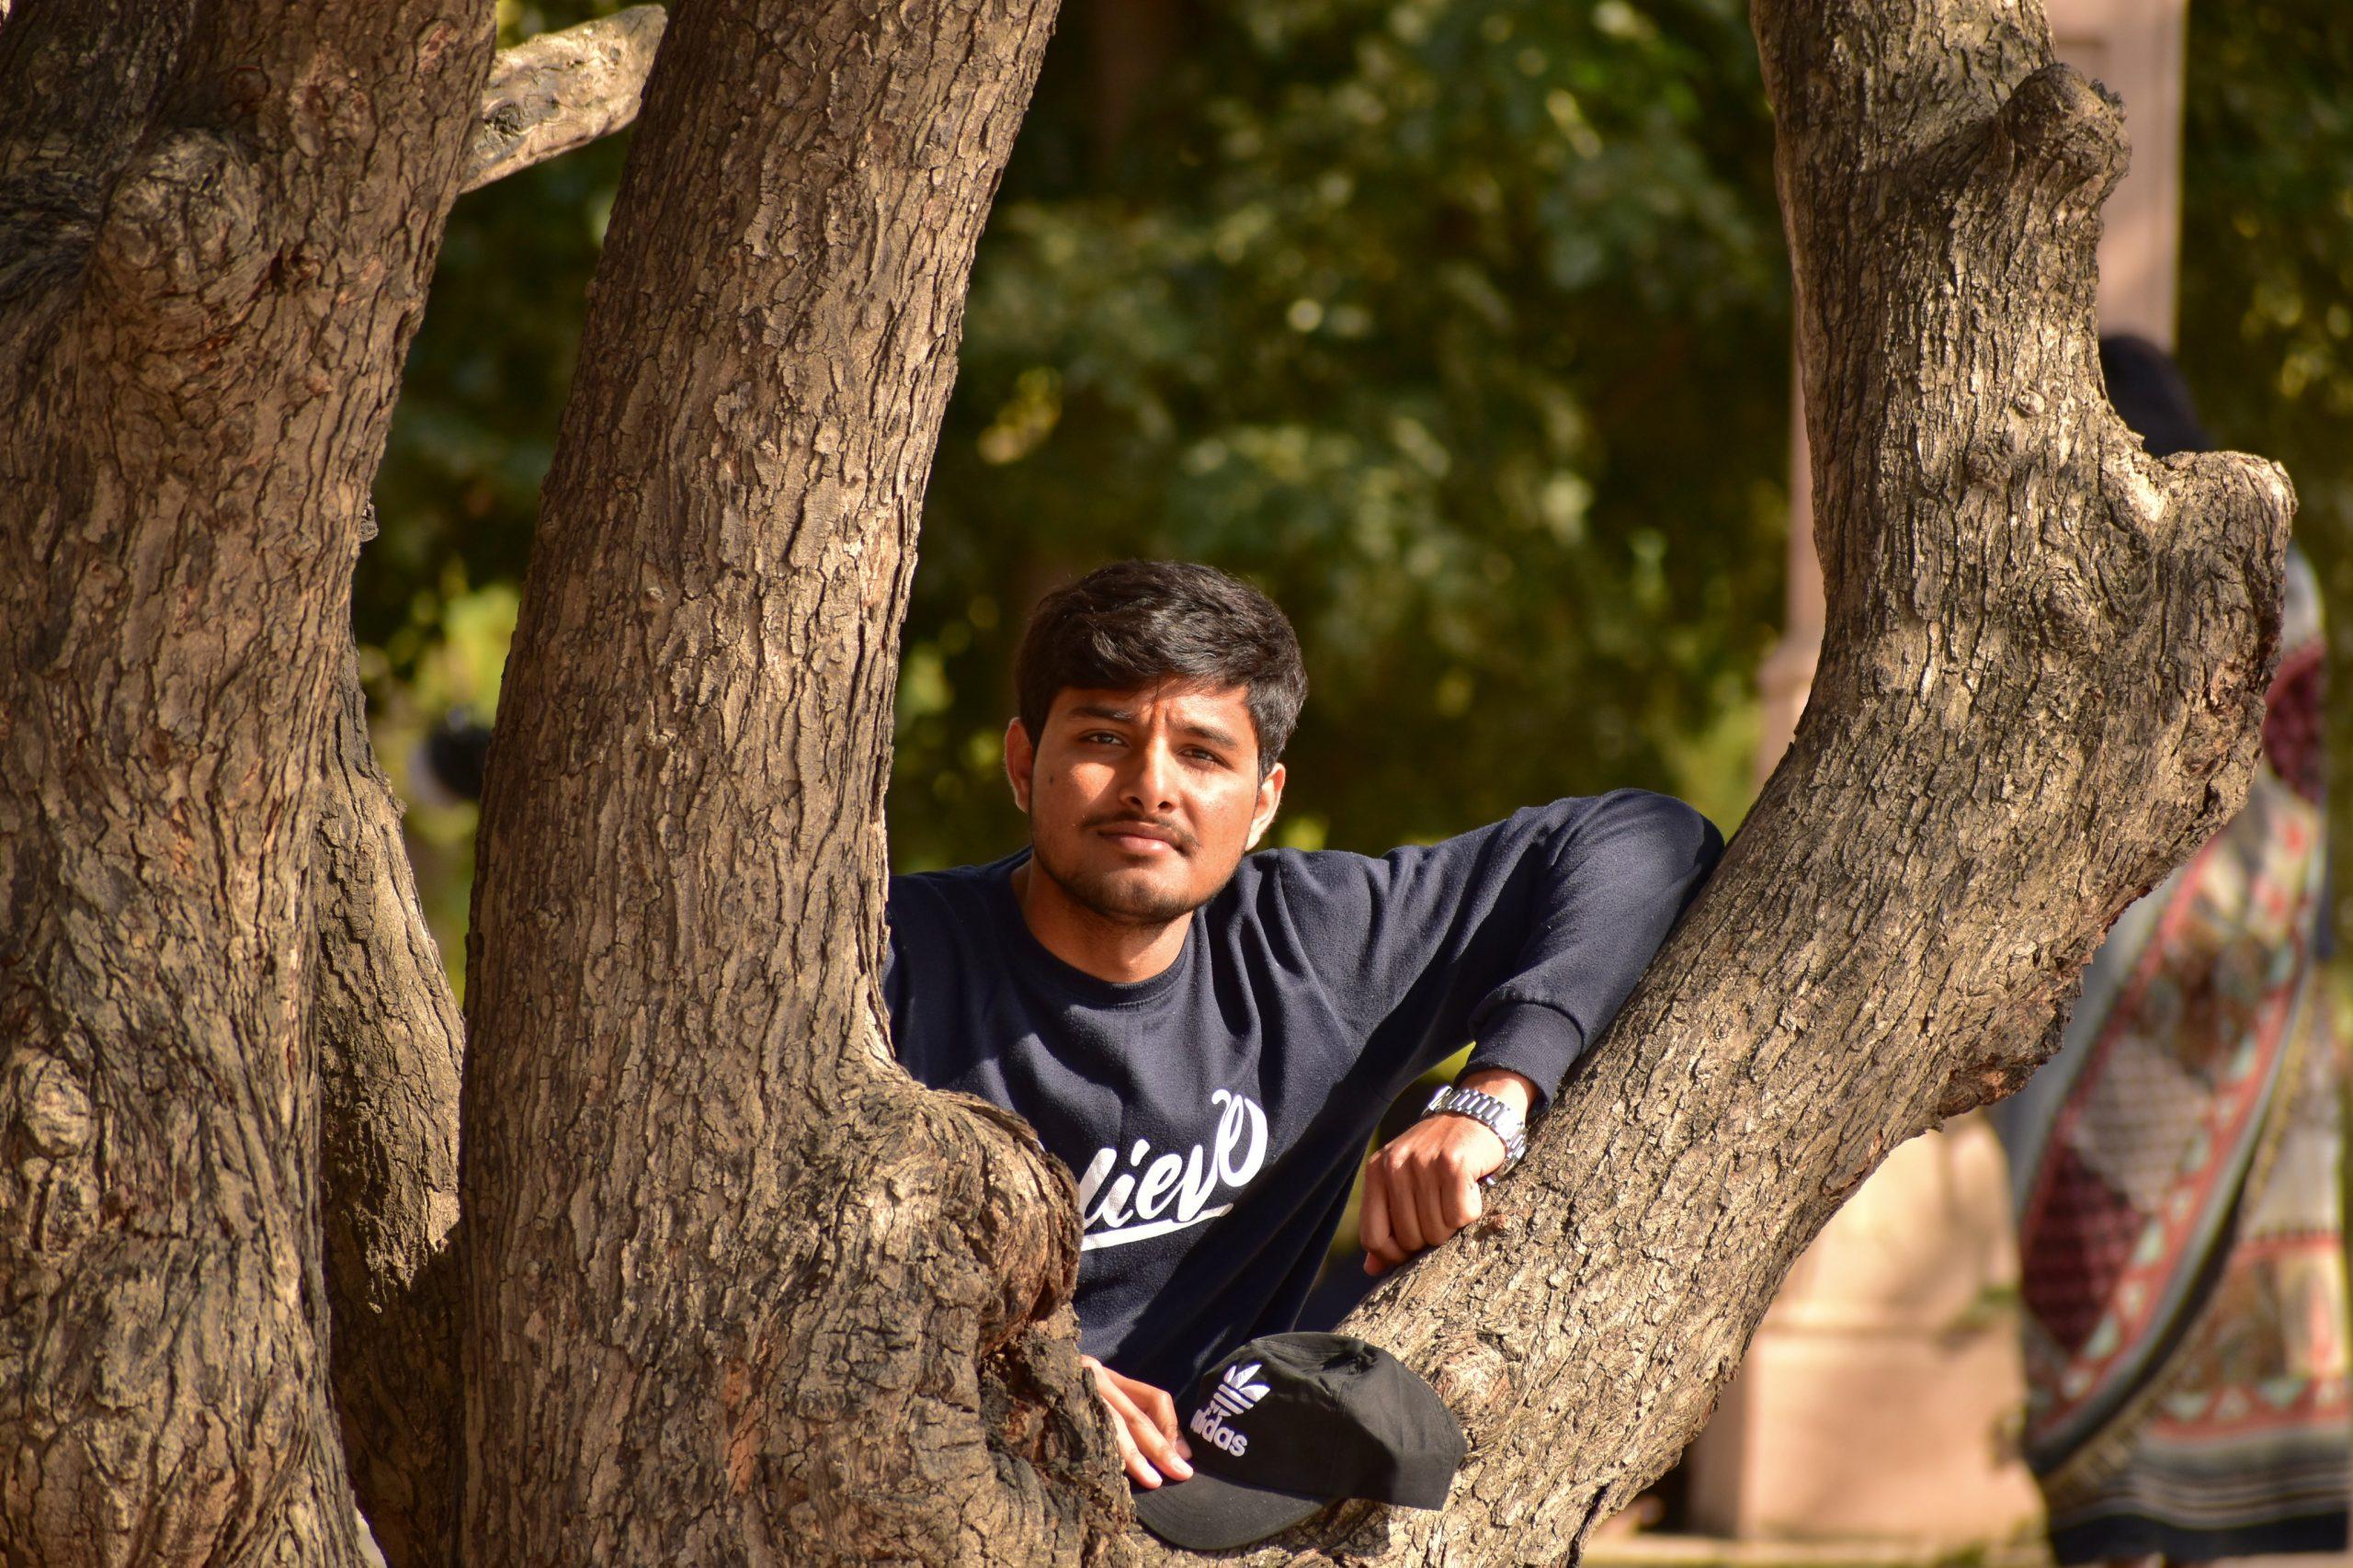 A boy on a tree